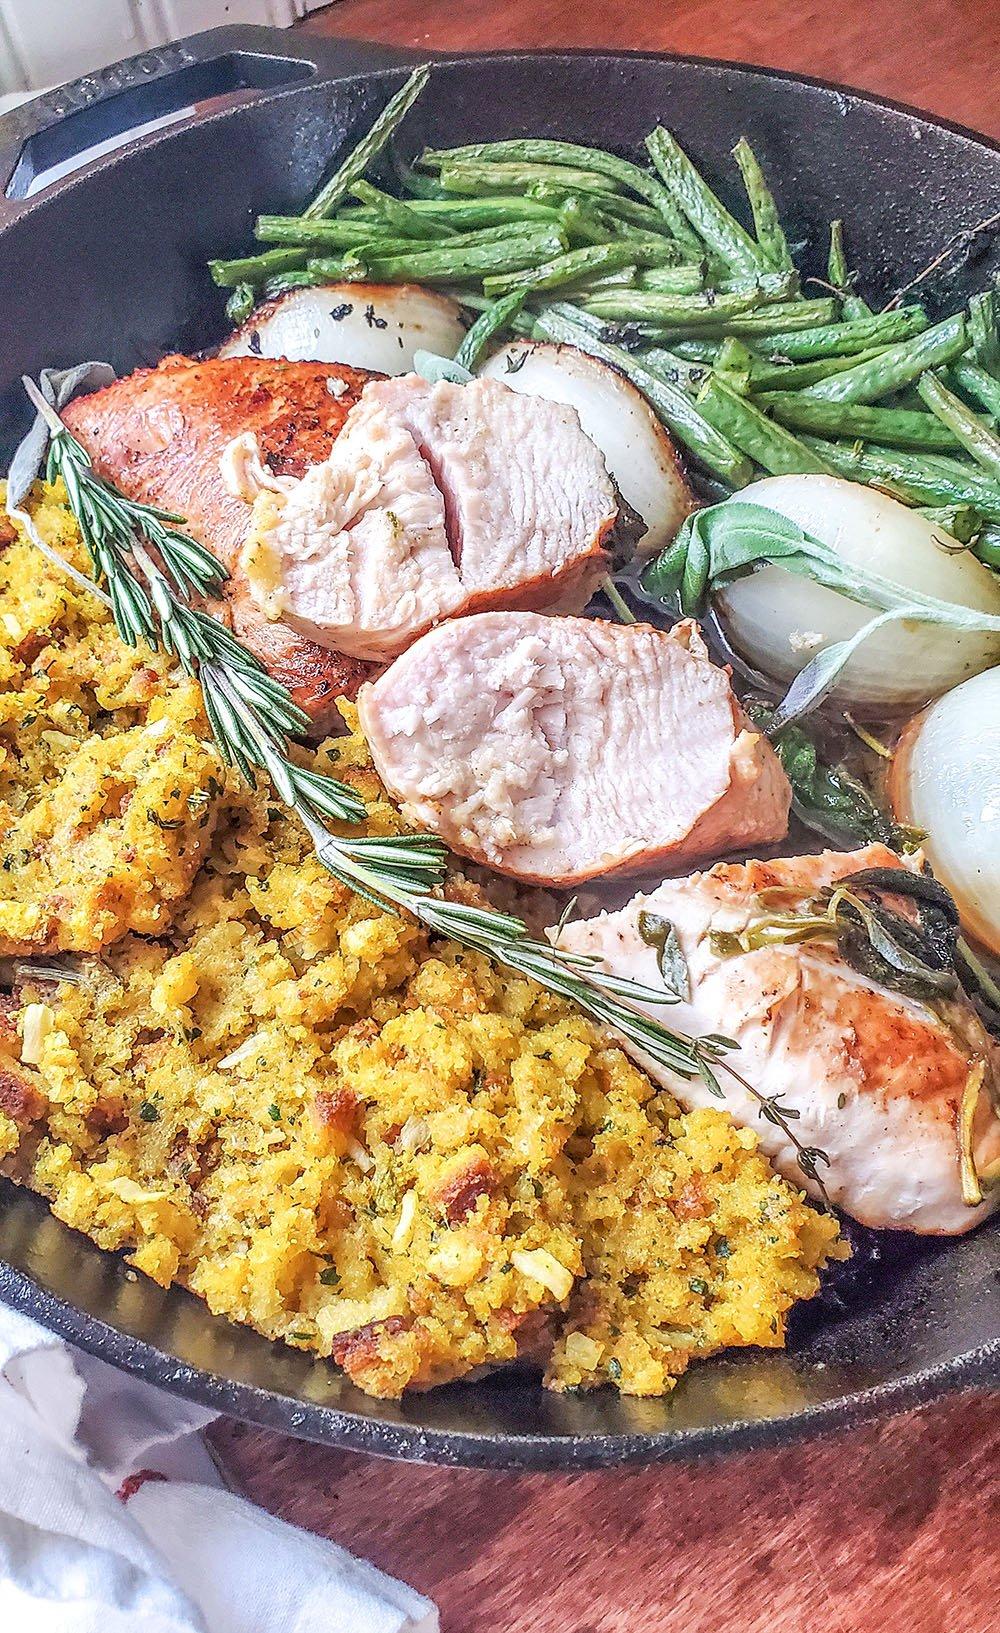 Turkey tenderloin dinner cooked up in a cast iron pan. Juicy turkey served along crispy green beans.